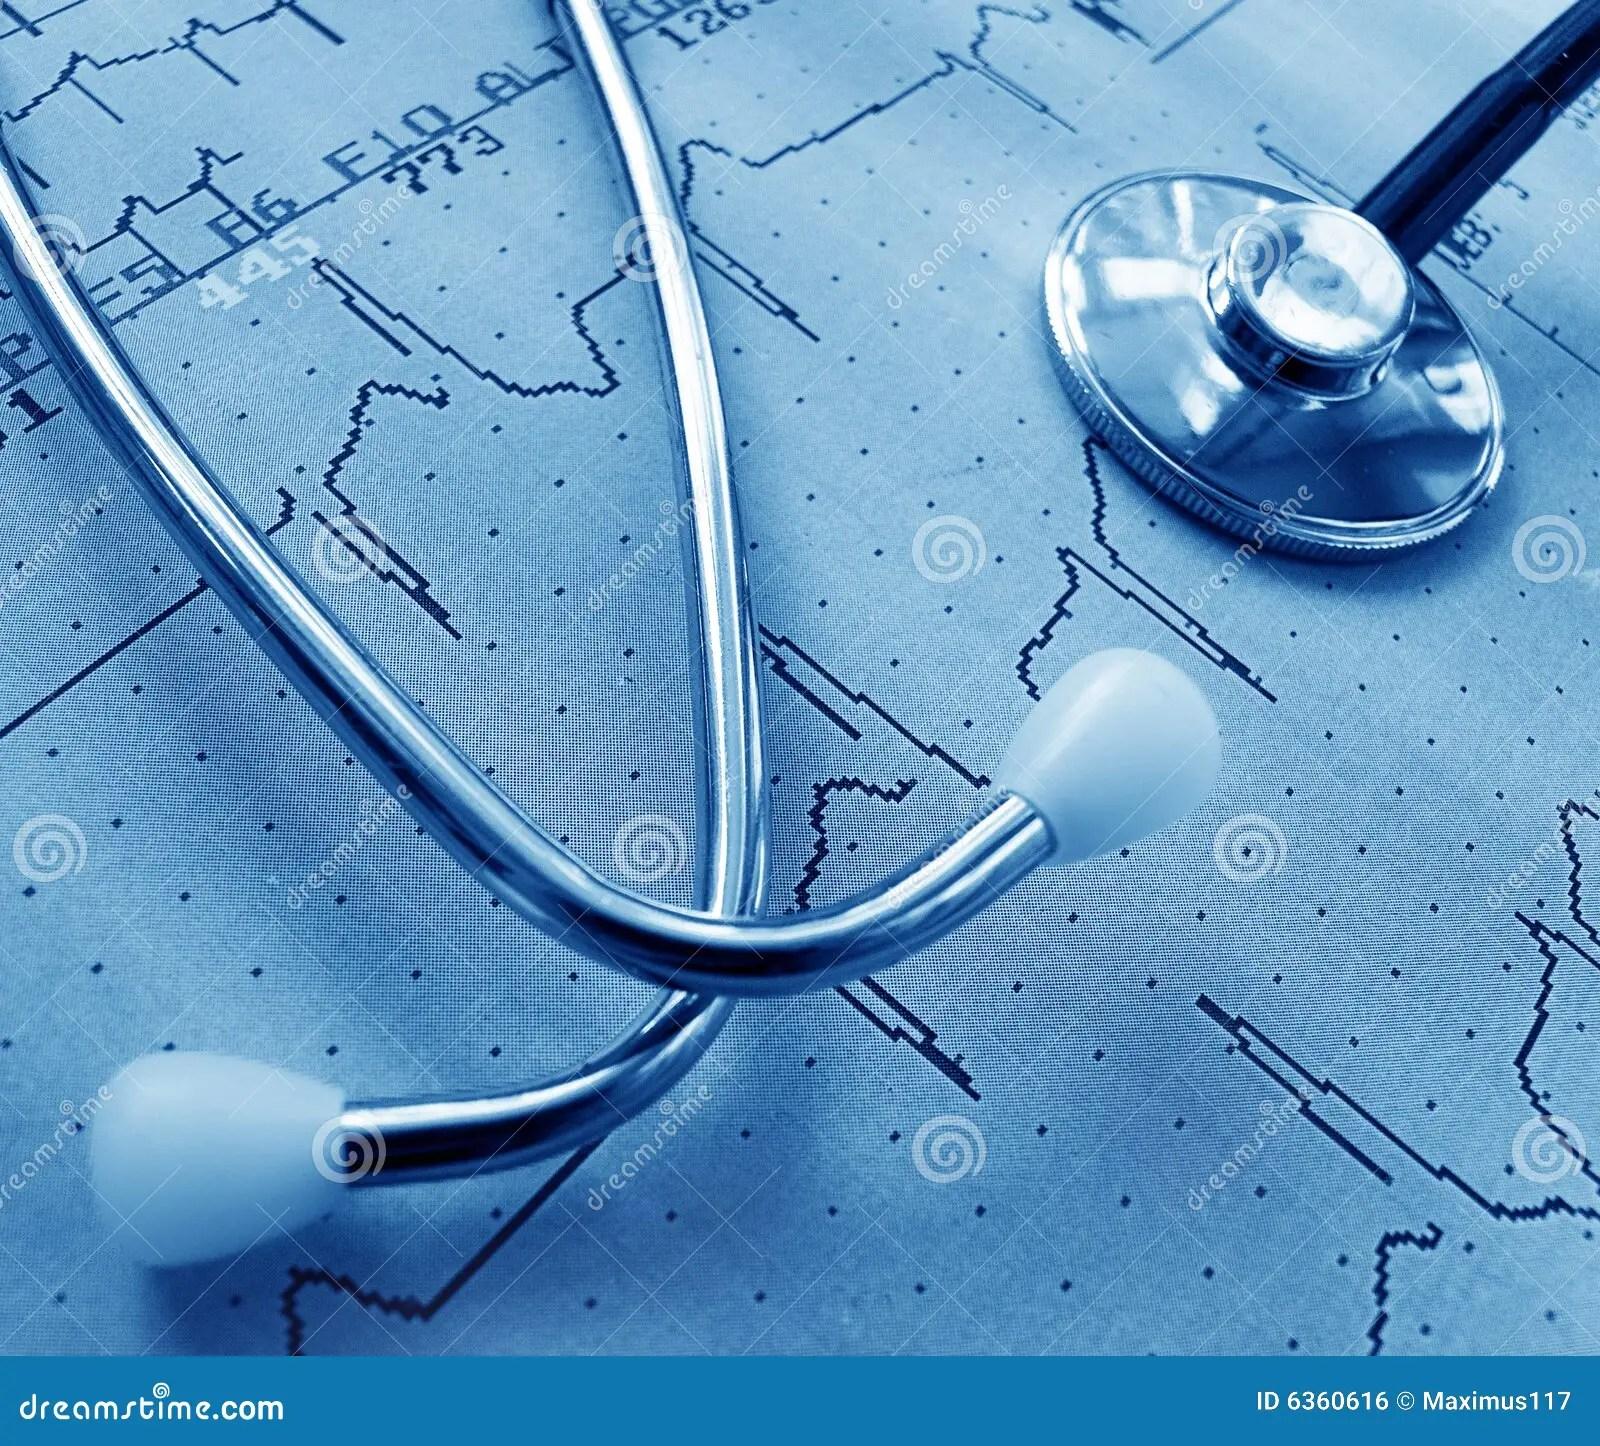 Doctor Symbol Hd Wallpaper Medical Stock Photo Image Of Closeup Instrument